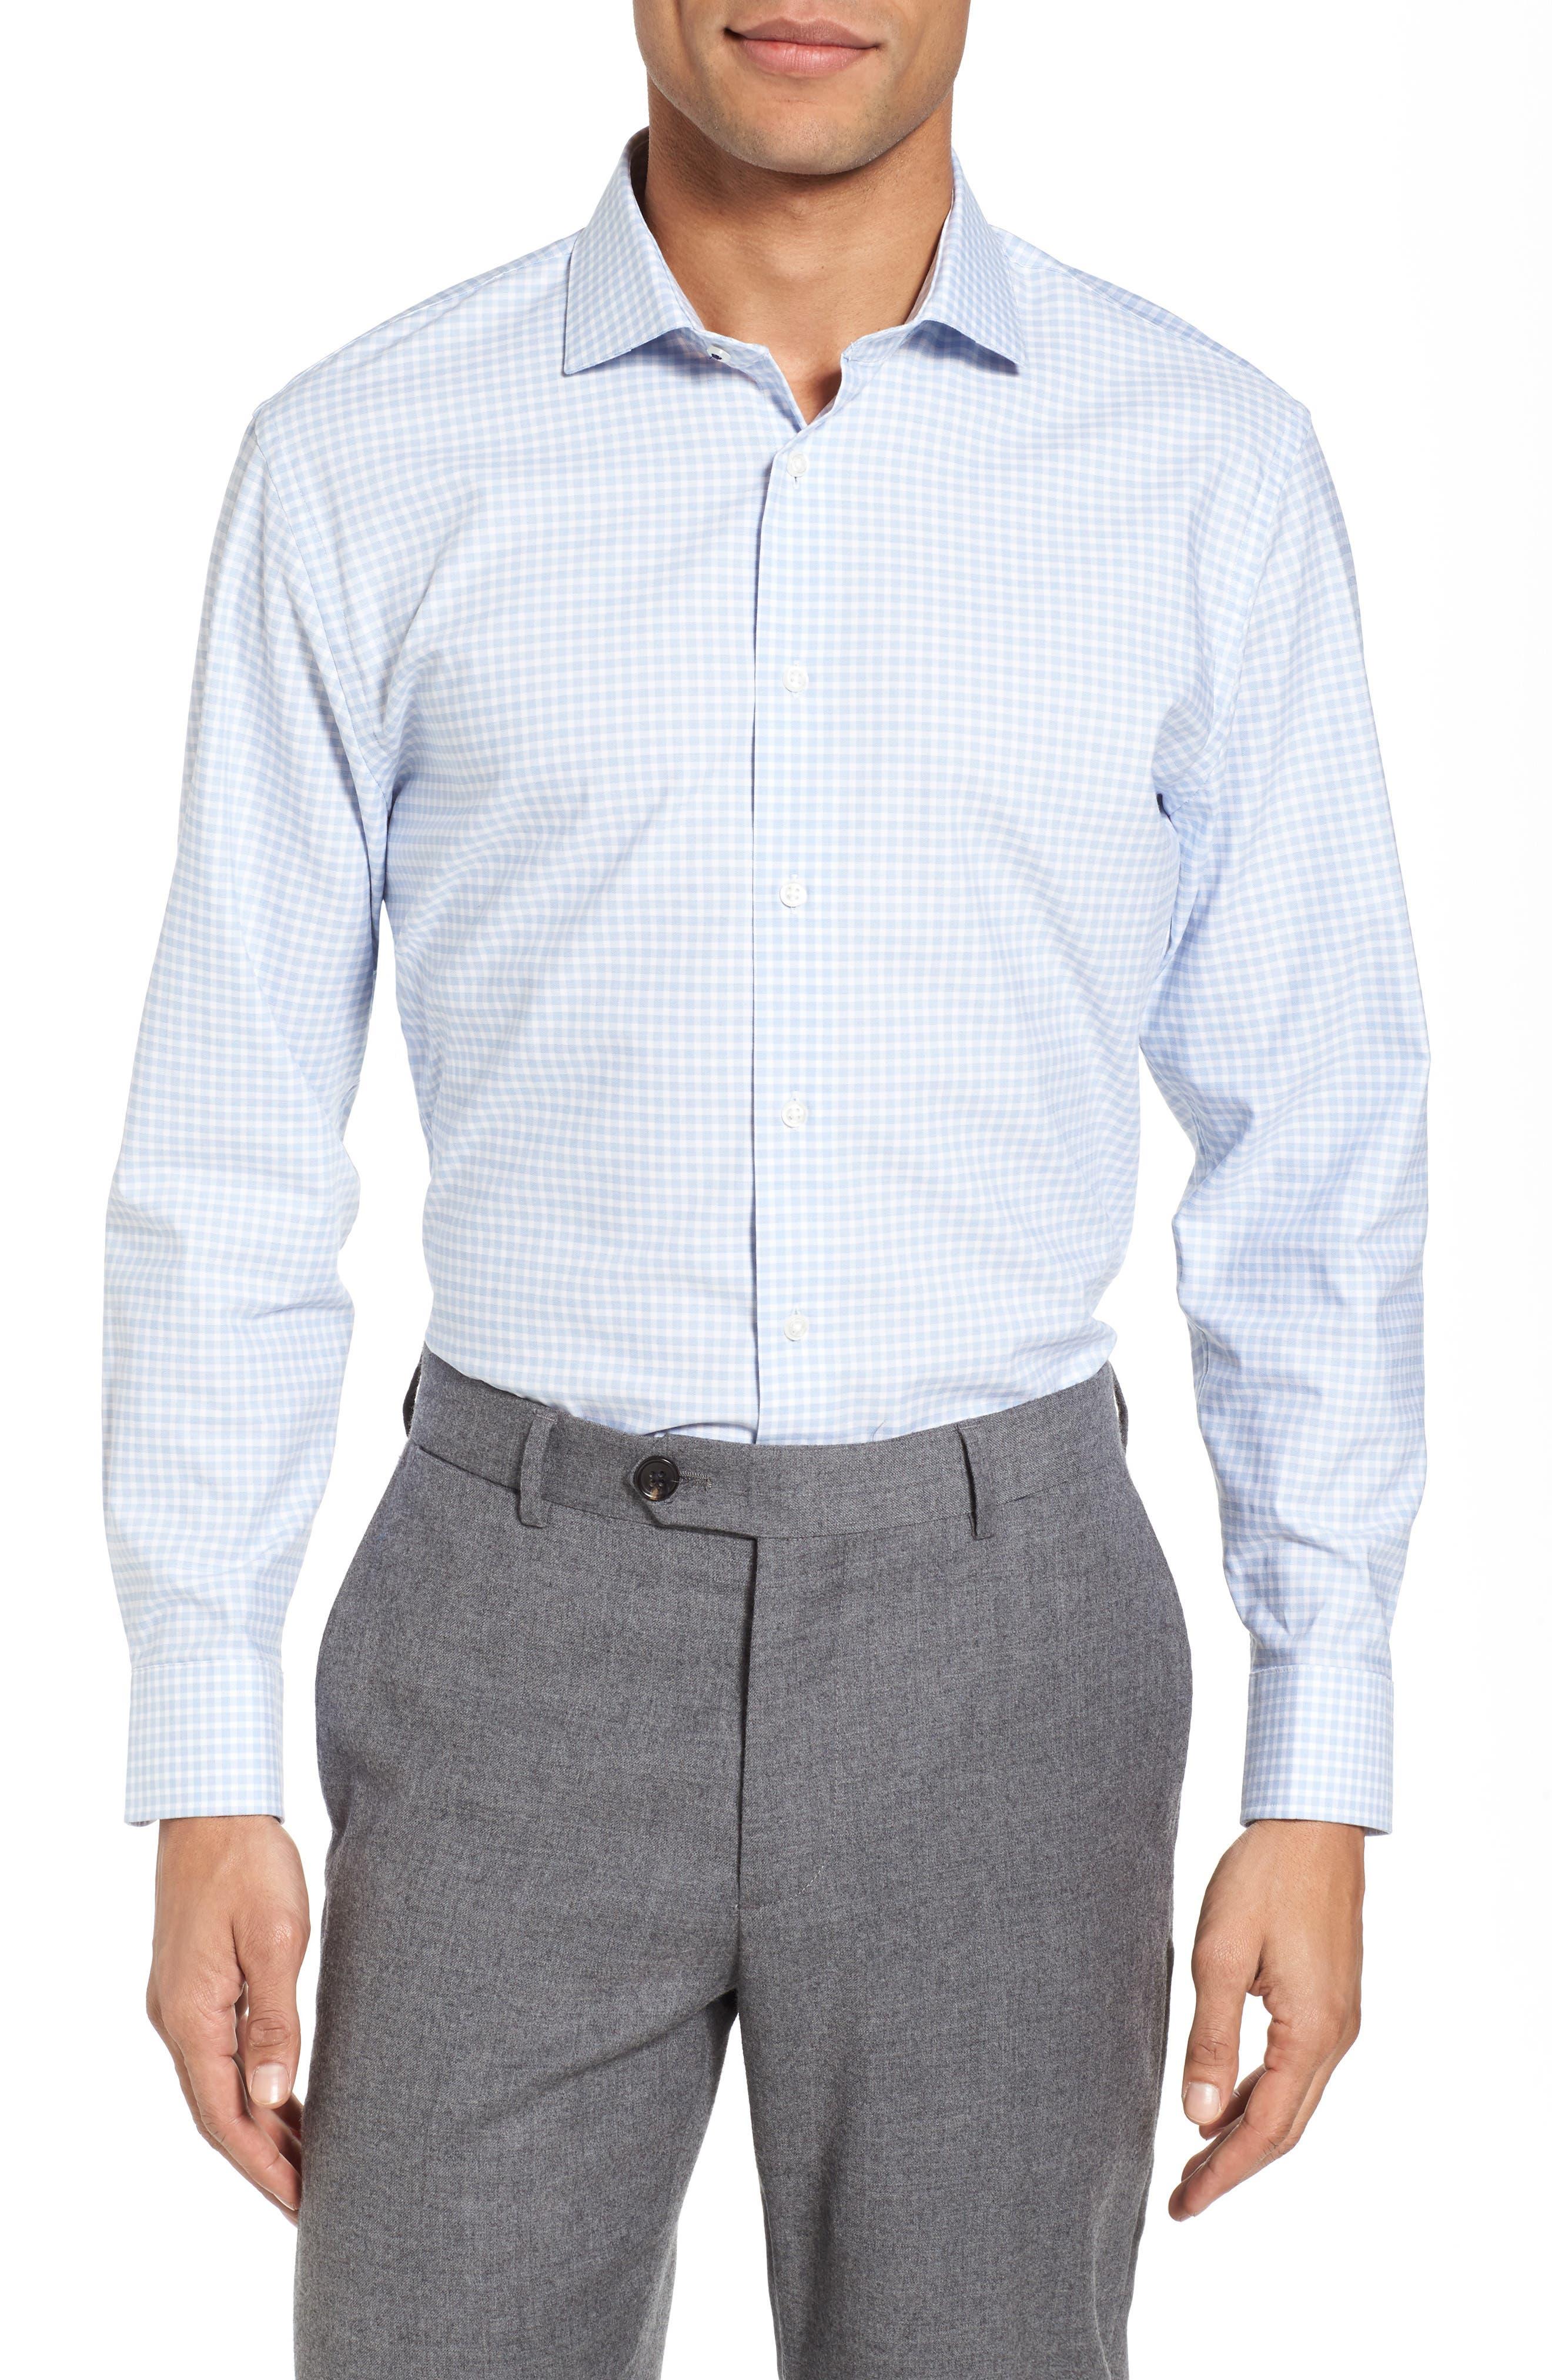 Tech-Smart Trim Fit Stretch Check Dress Shirt,                             Main thumbnail 1, color,                             Blue Brunerra